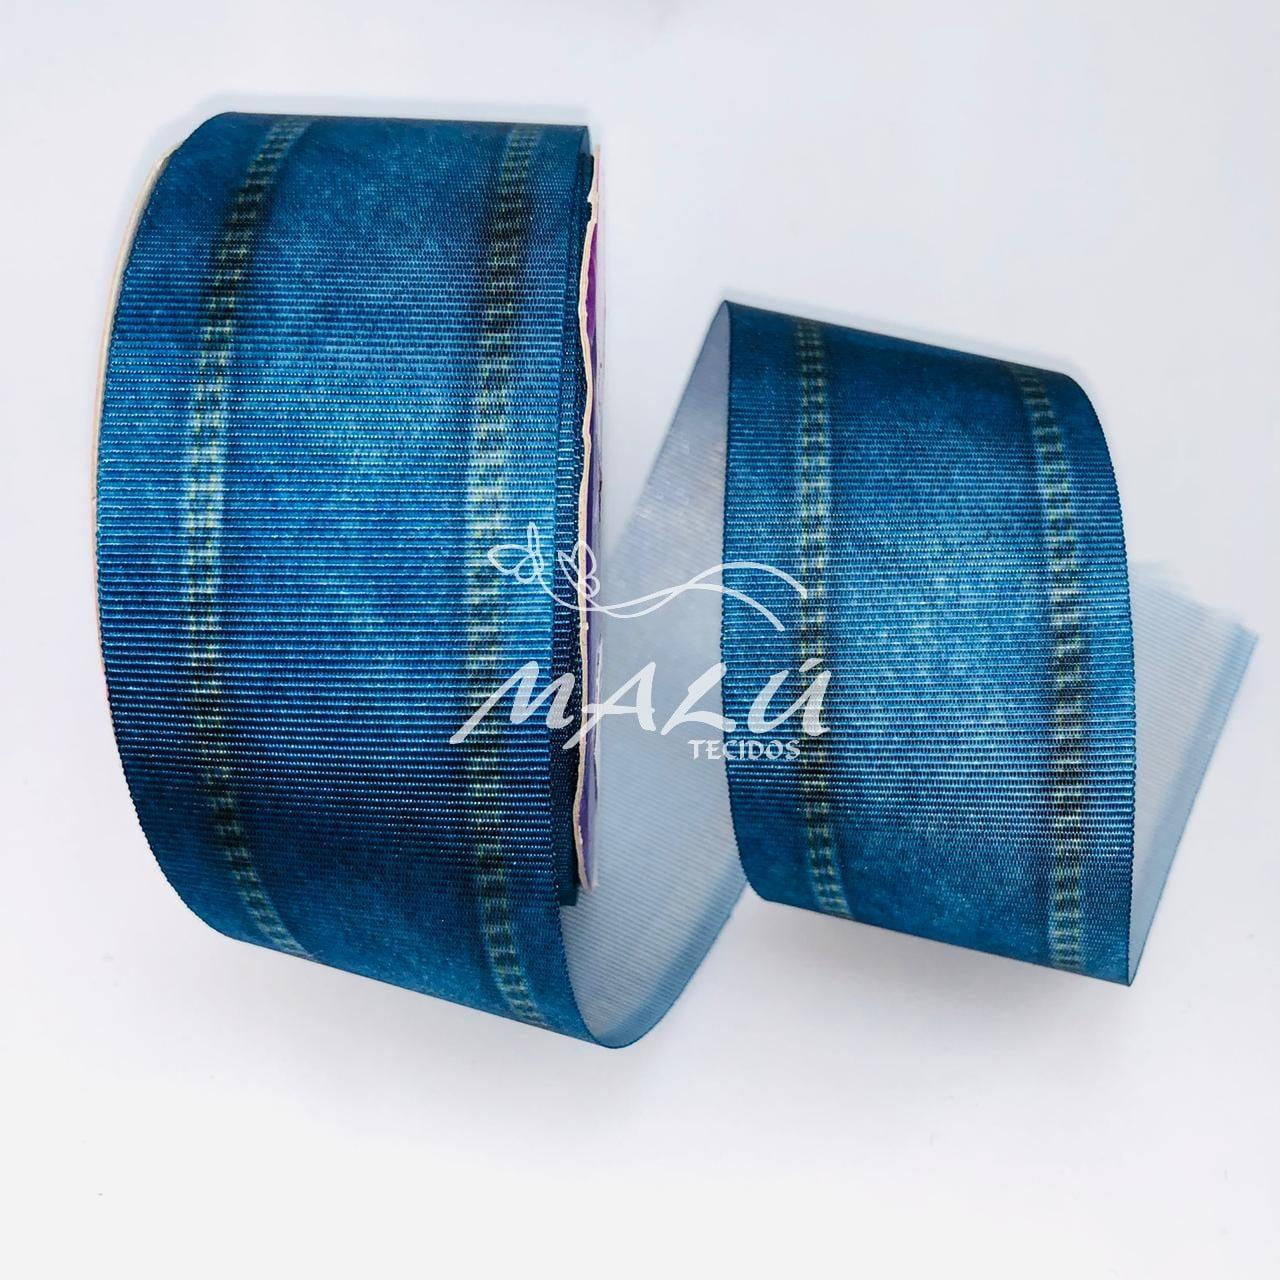 Fita Gorgurão Estampada Jeans N9 10mts